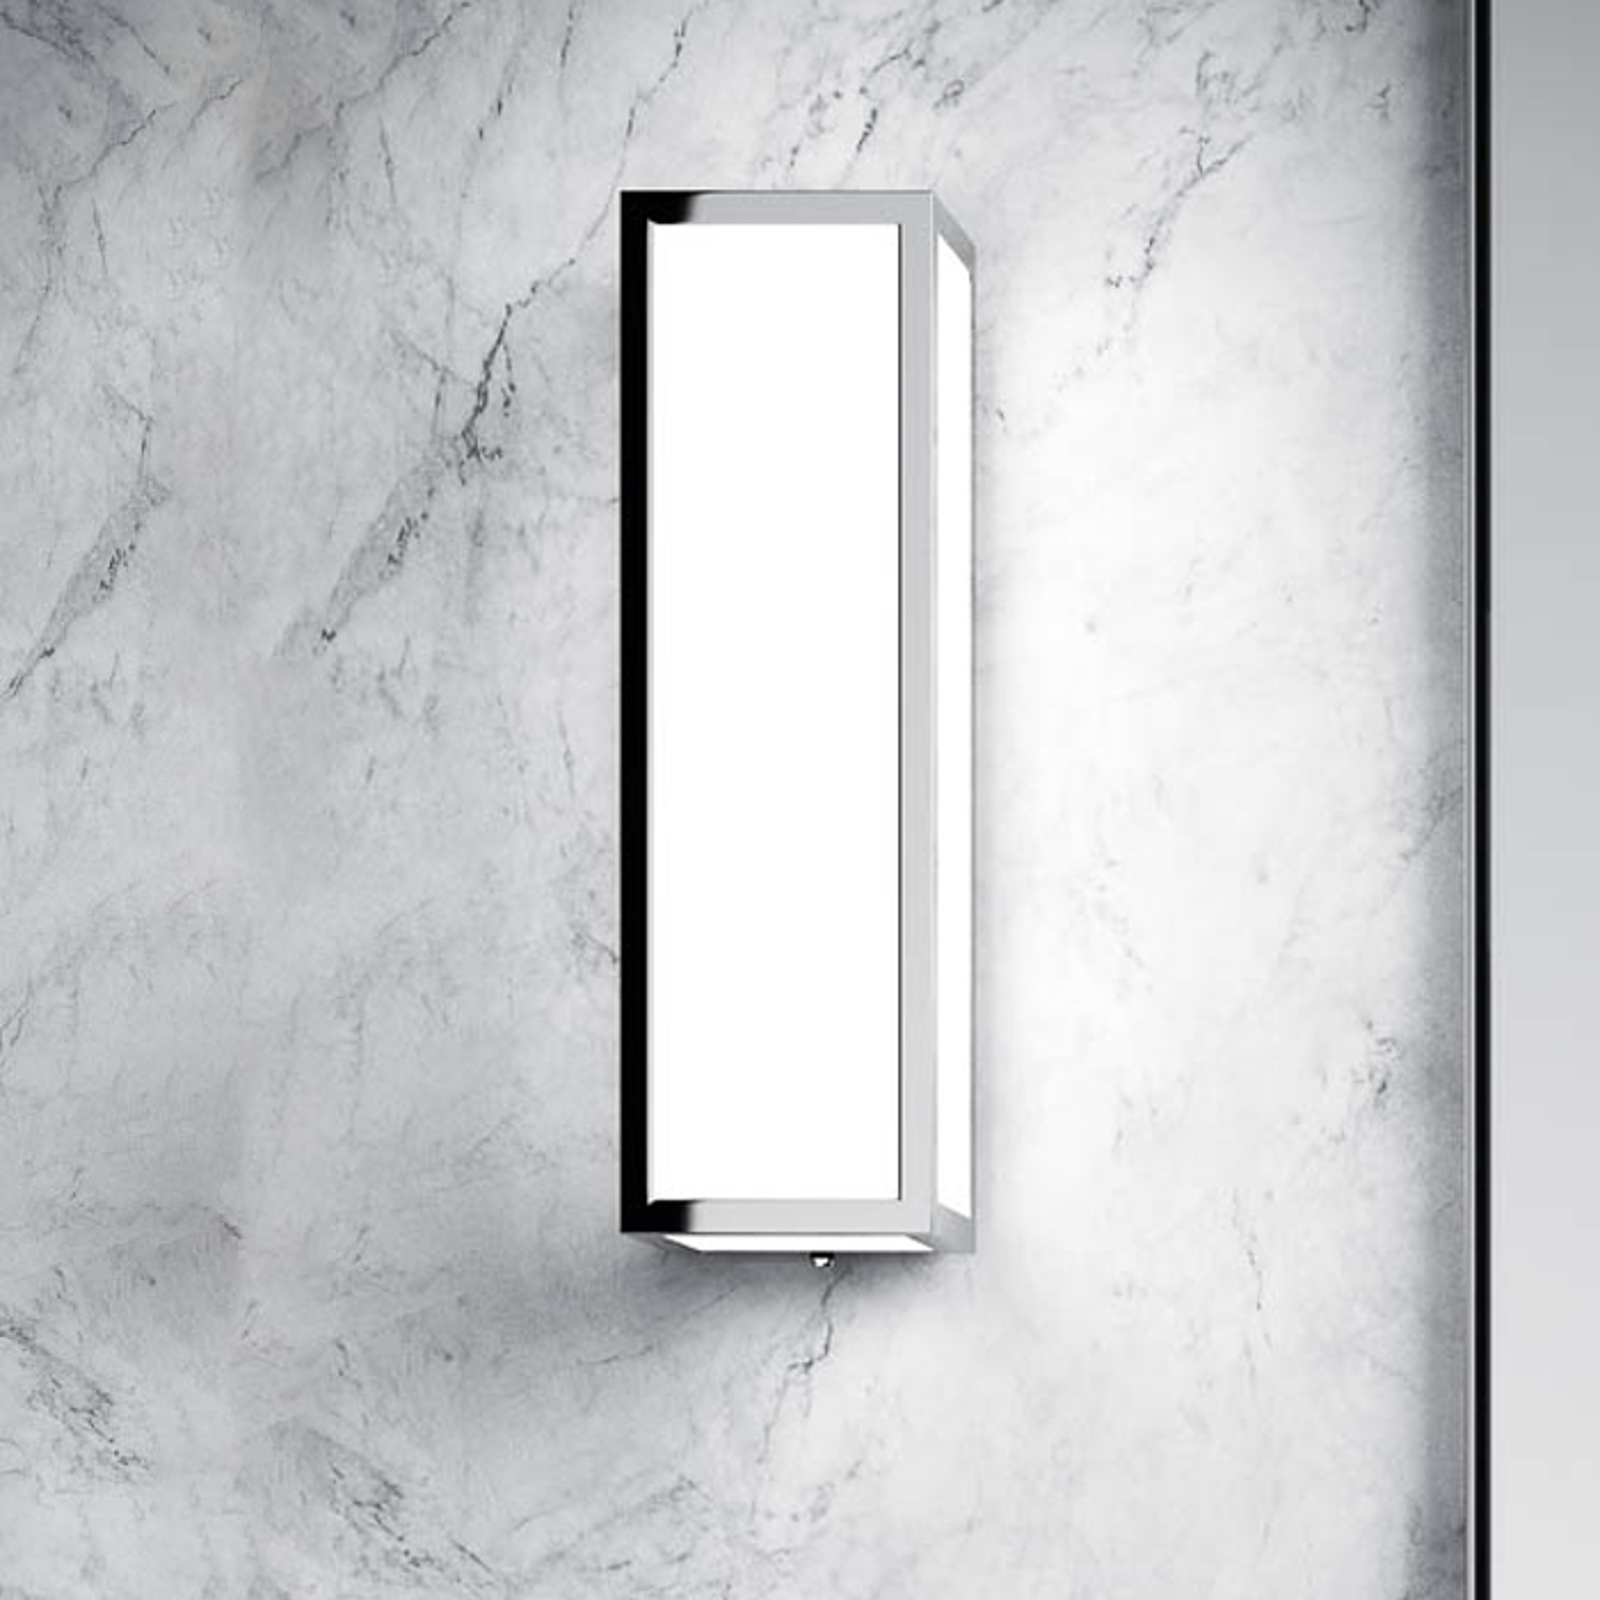 Decor Walther Bauhaus 20 N LED Wandleuchte, chrom